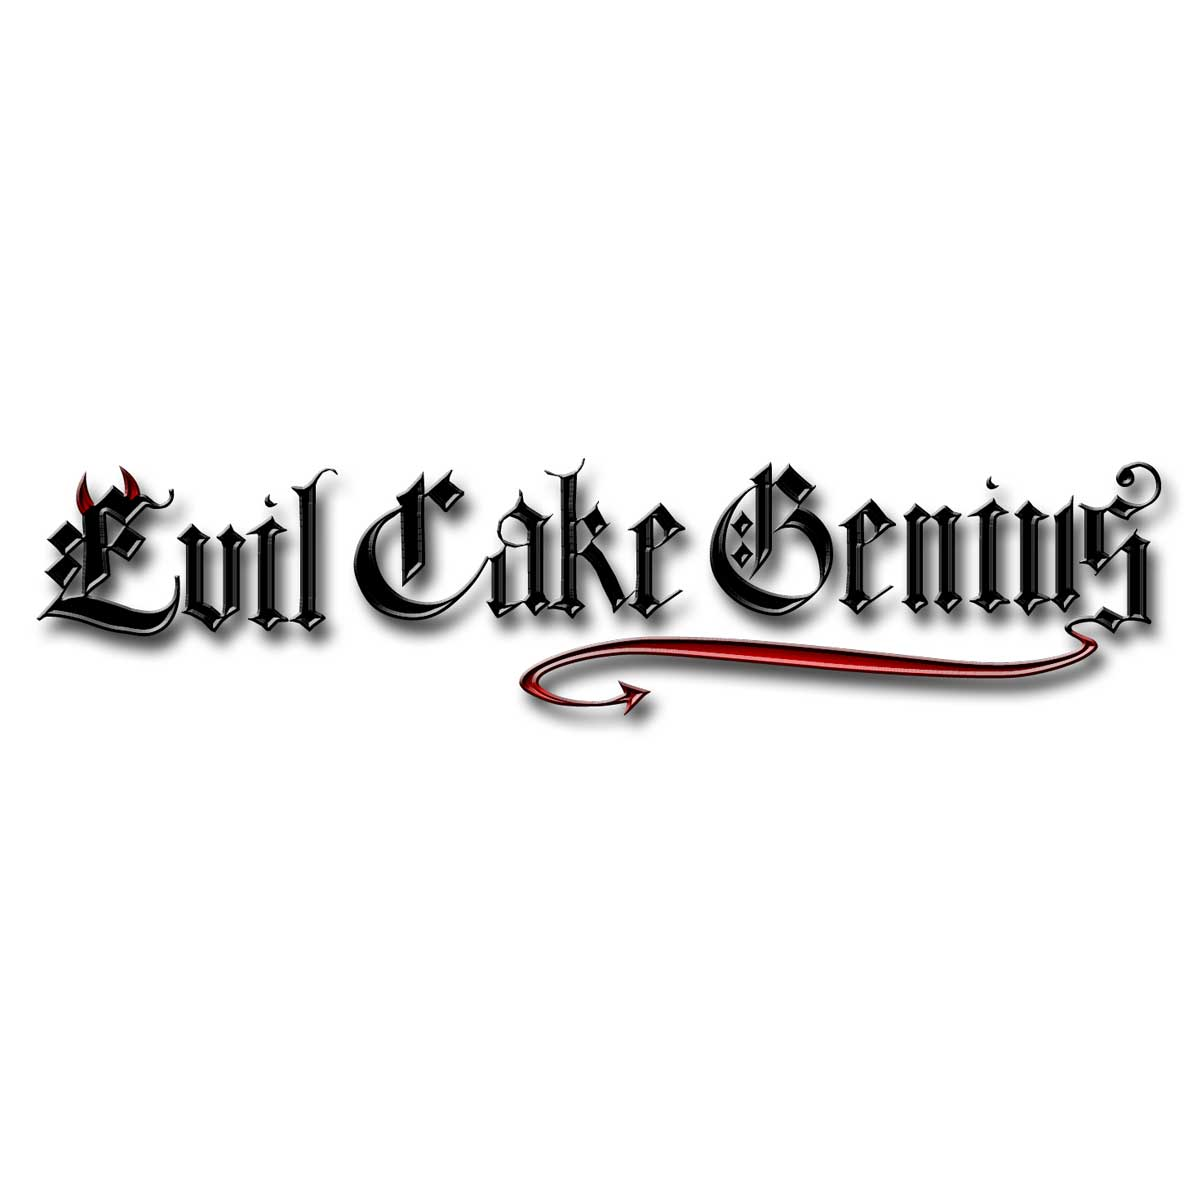 Sugar Skull Seamless Pattern Mesh Stencil - Evil Cake Genius